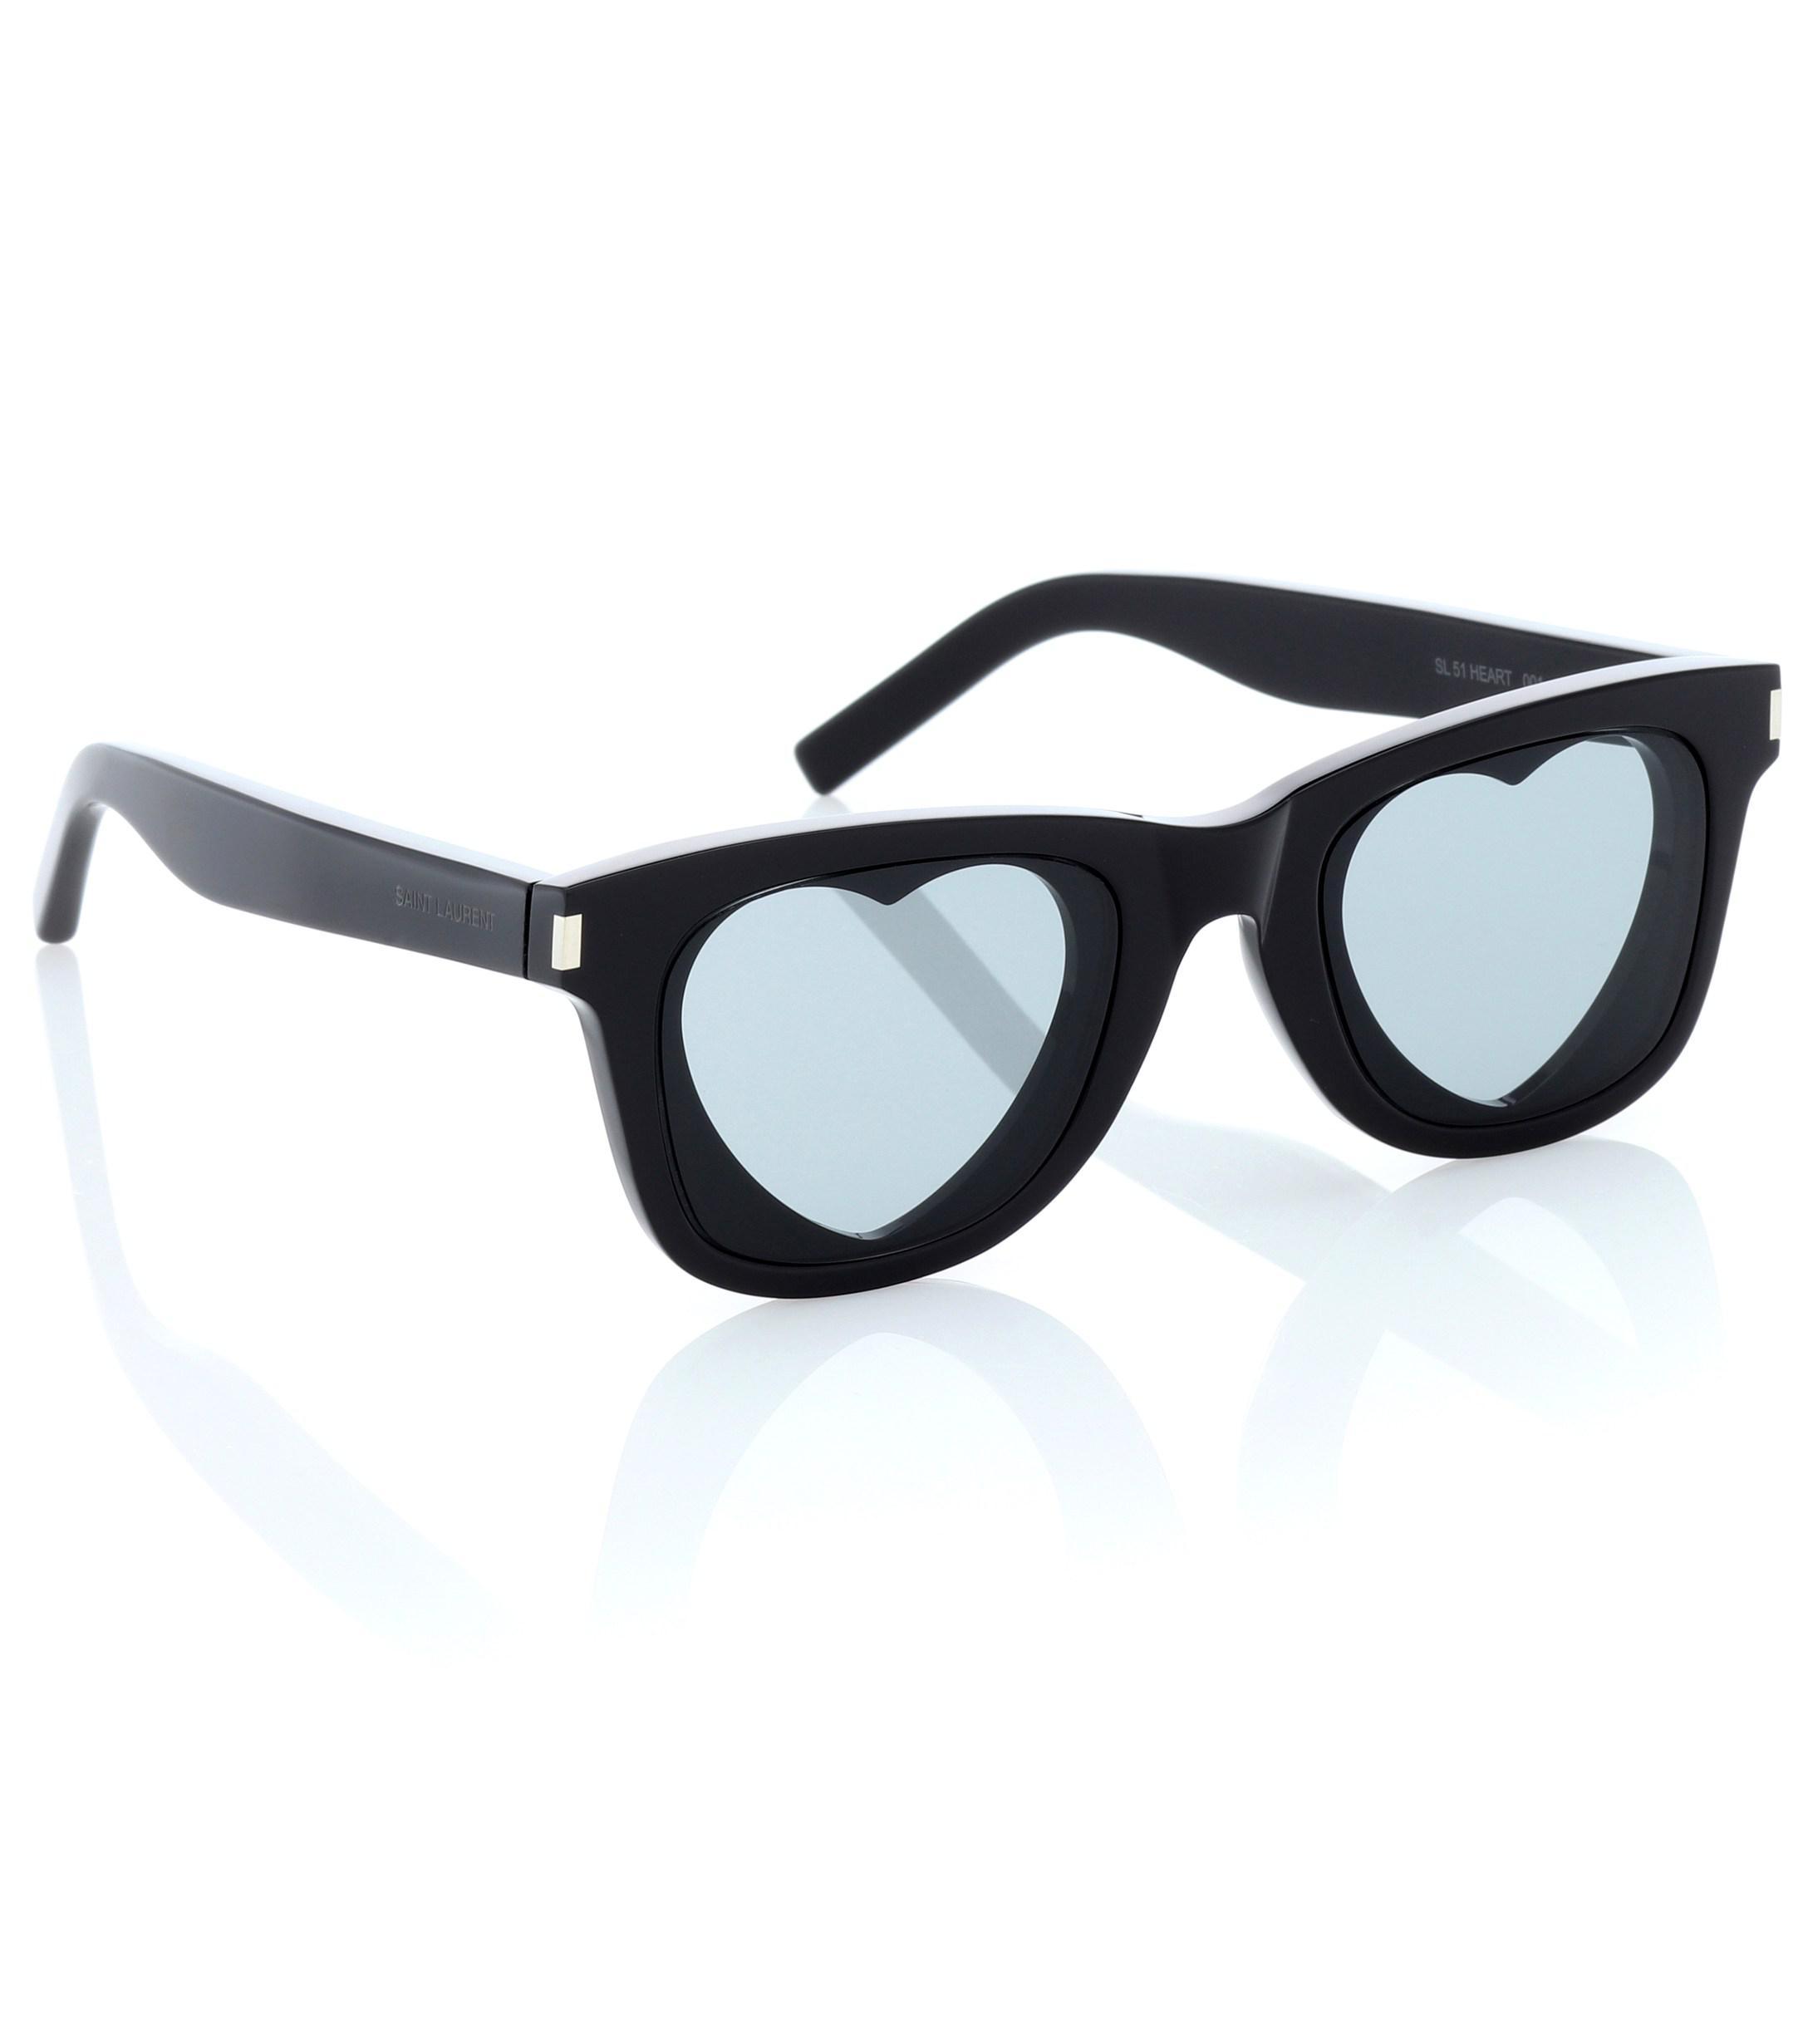 95ff85c7d6 Lyst - Saint Laurent Classic Sl 51 Heart Sunglasses in Black